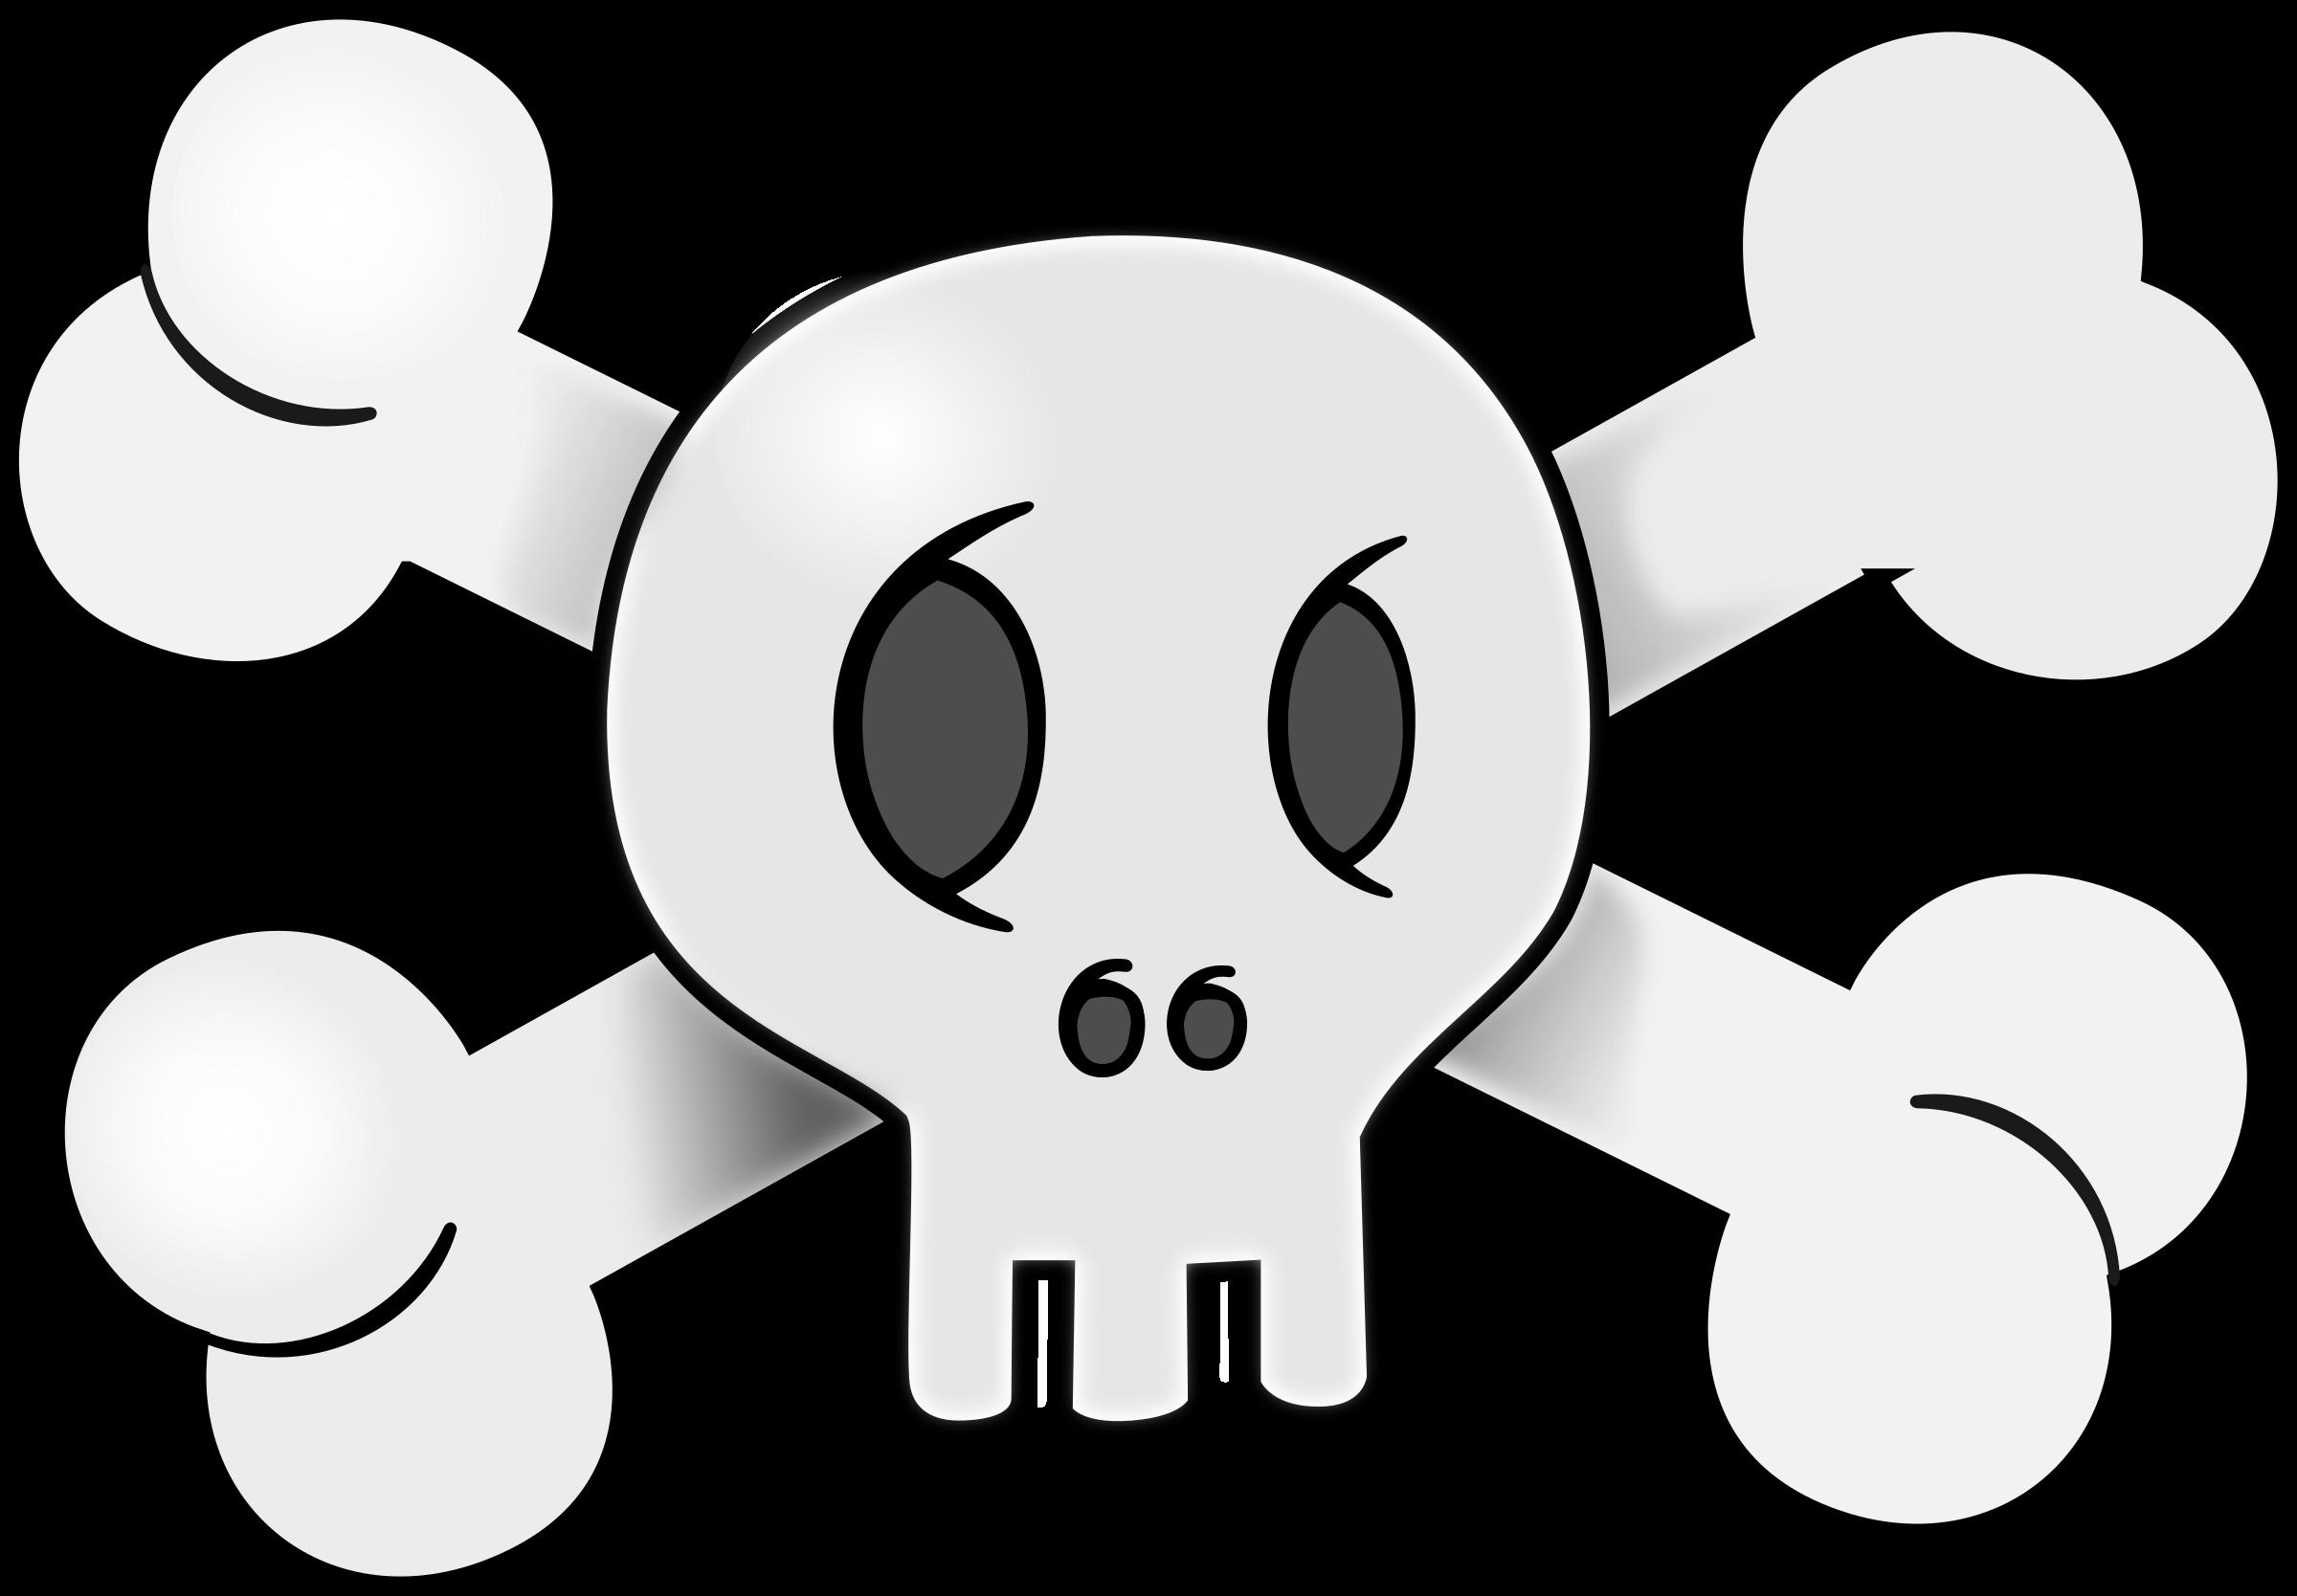 Skeleton clipart animated. Skull big image png